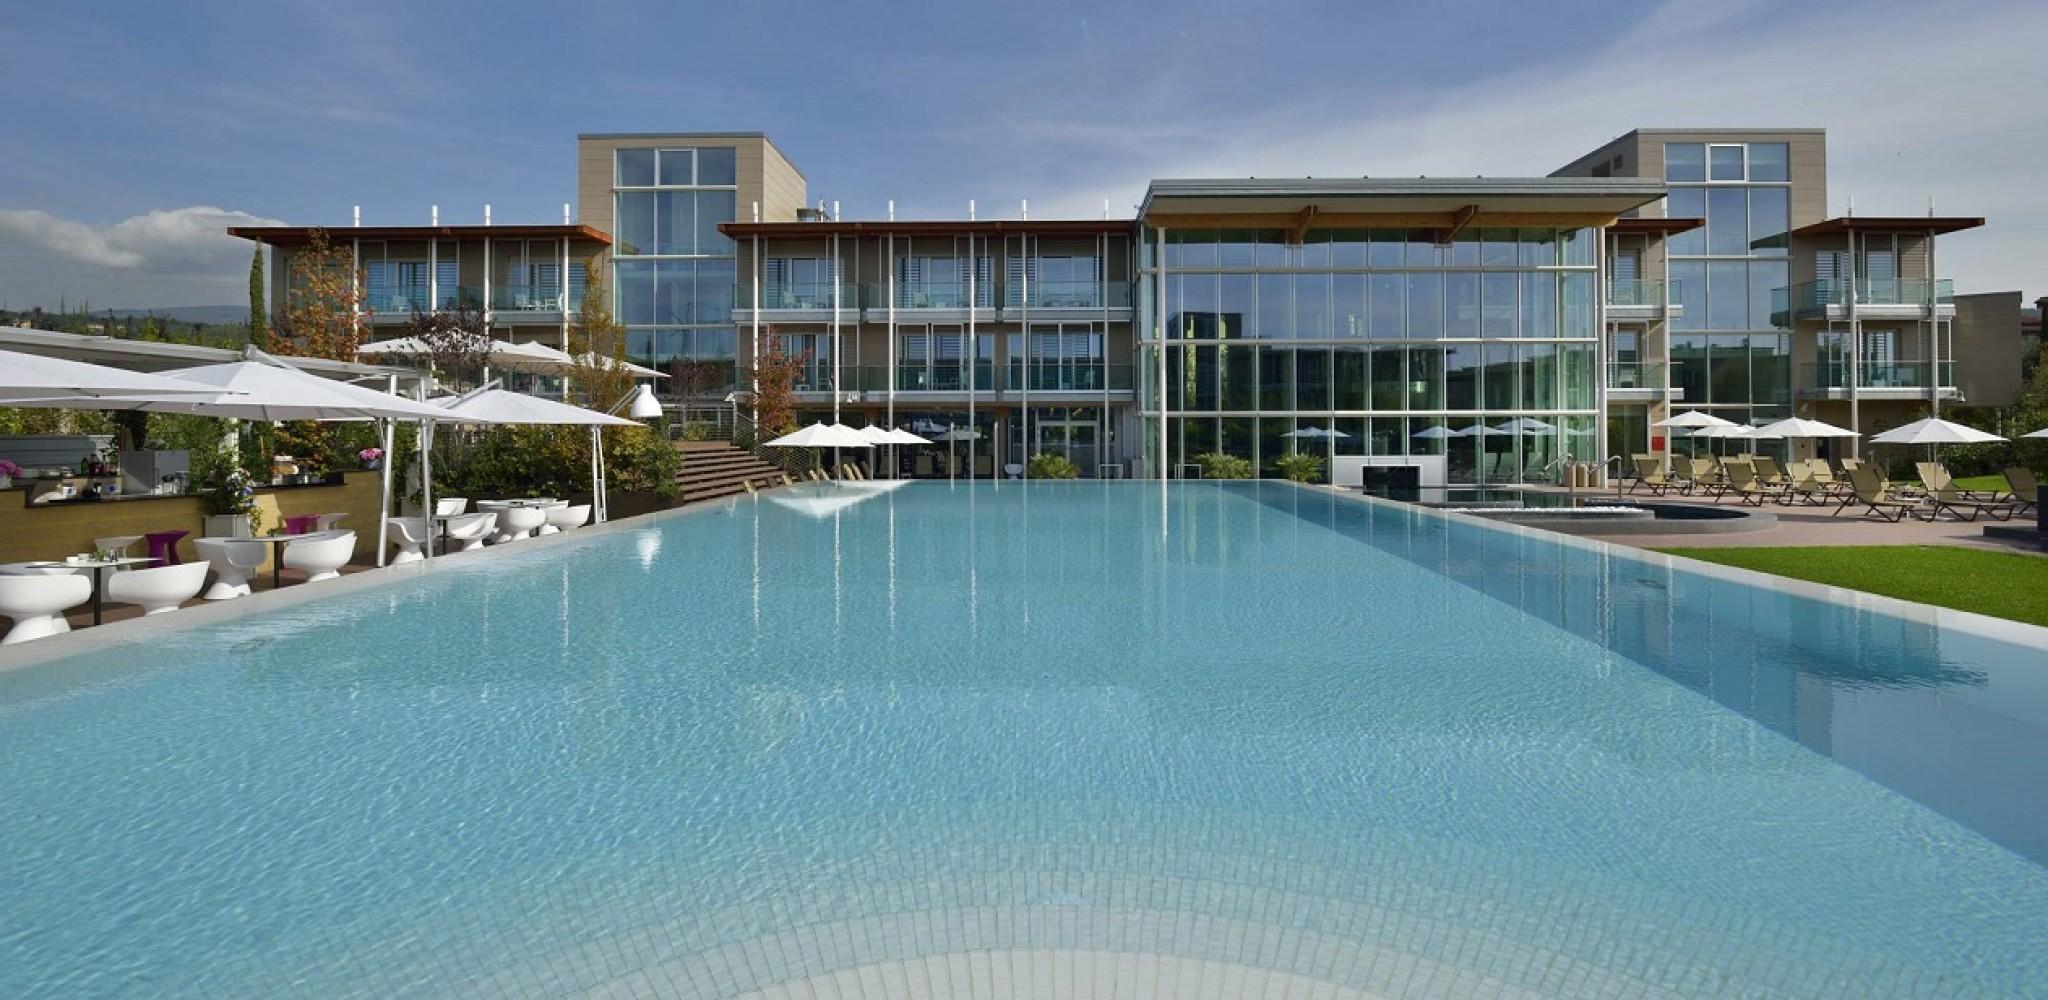 viaggi preziosi aqualux hotel bardolino slide